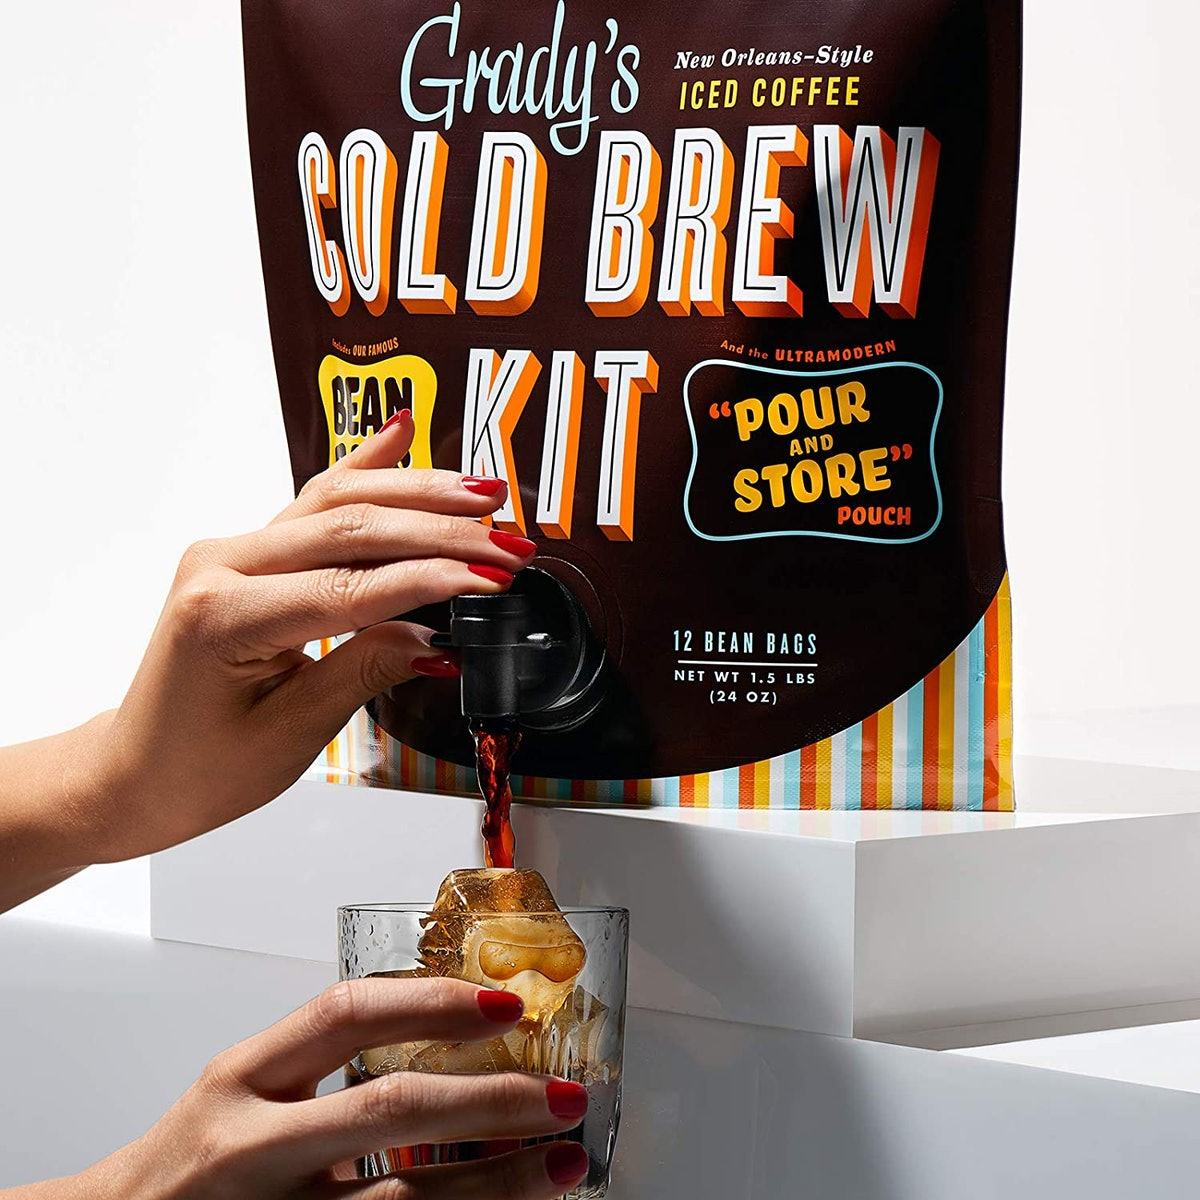 Grady's Cold Brew Iced Coffee Kit